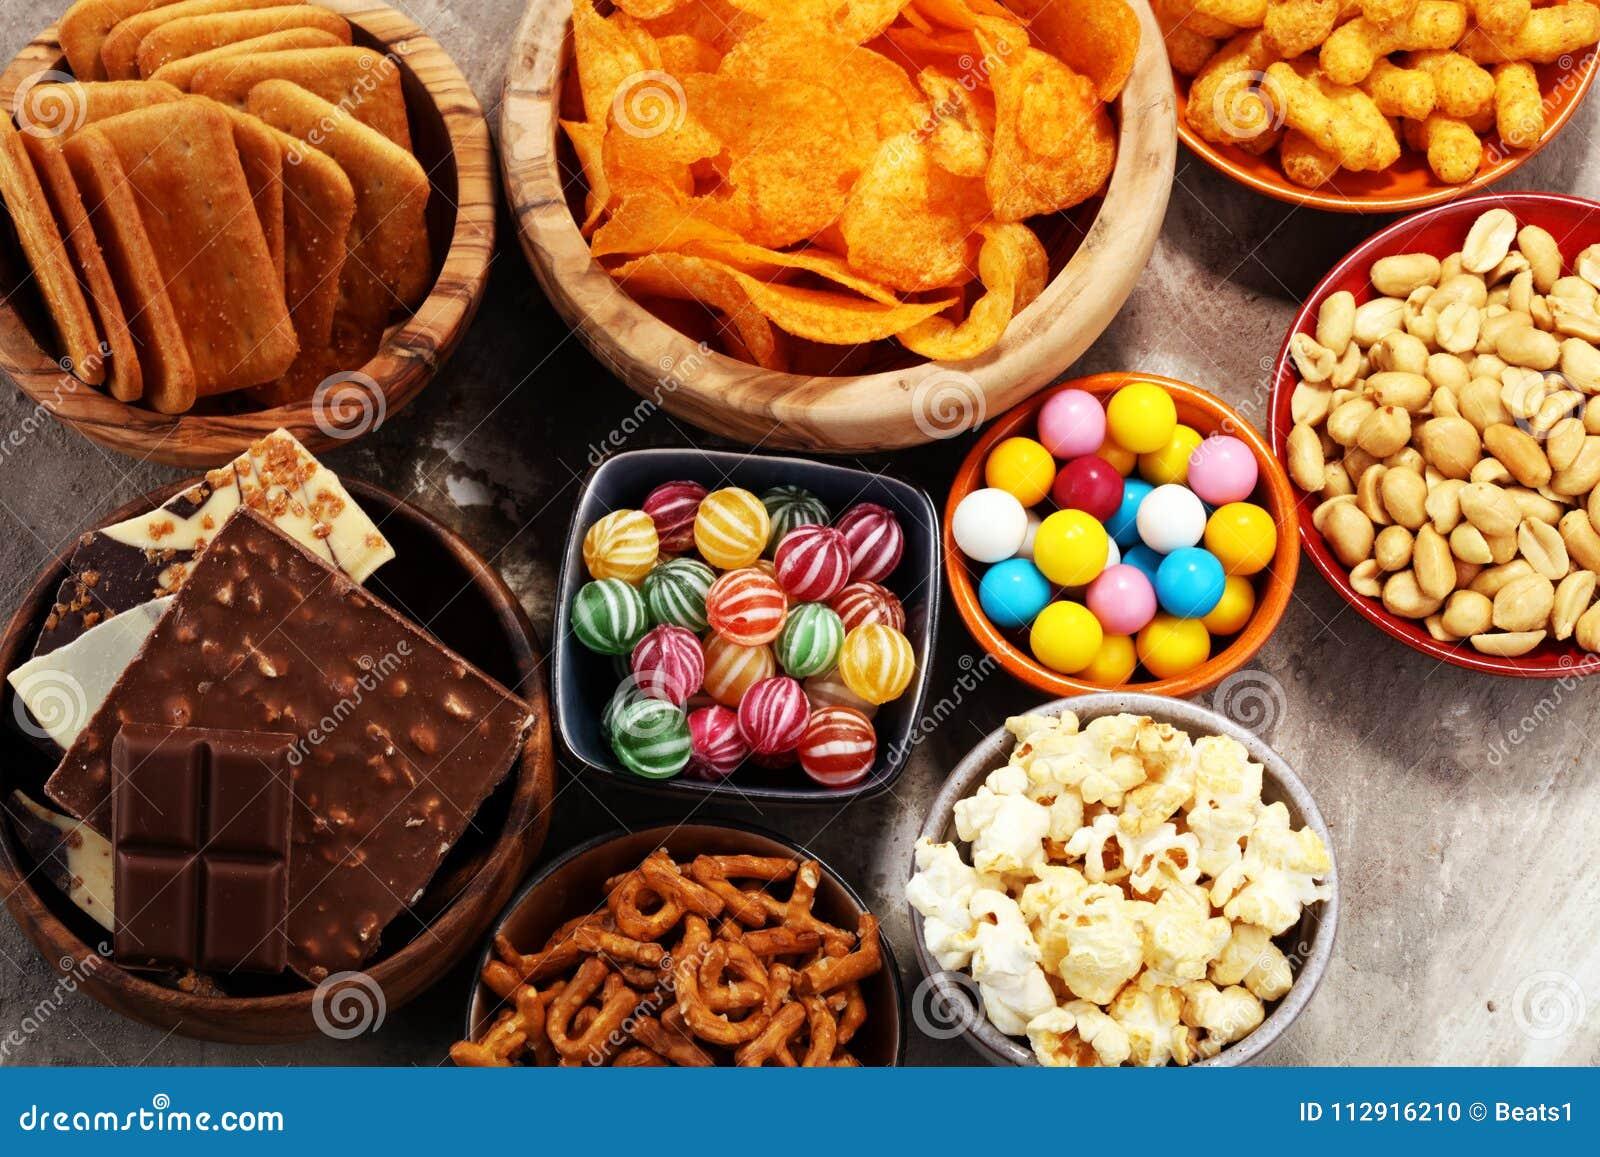 Zoute snacks Pretzels, spaanders, crackers in houten kommen